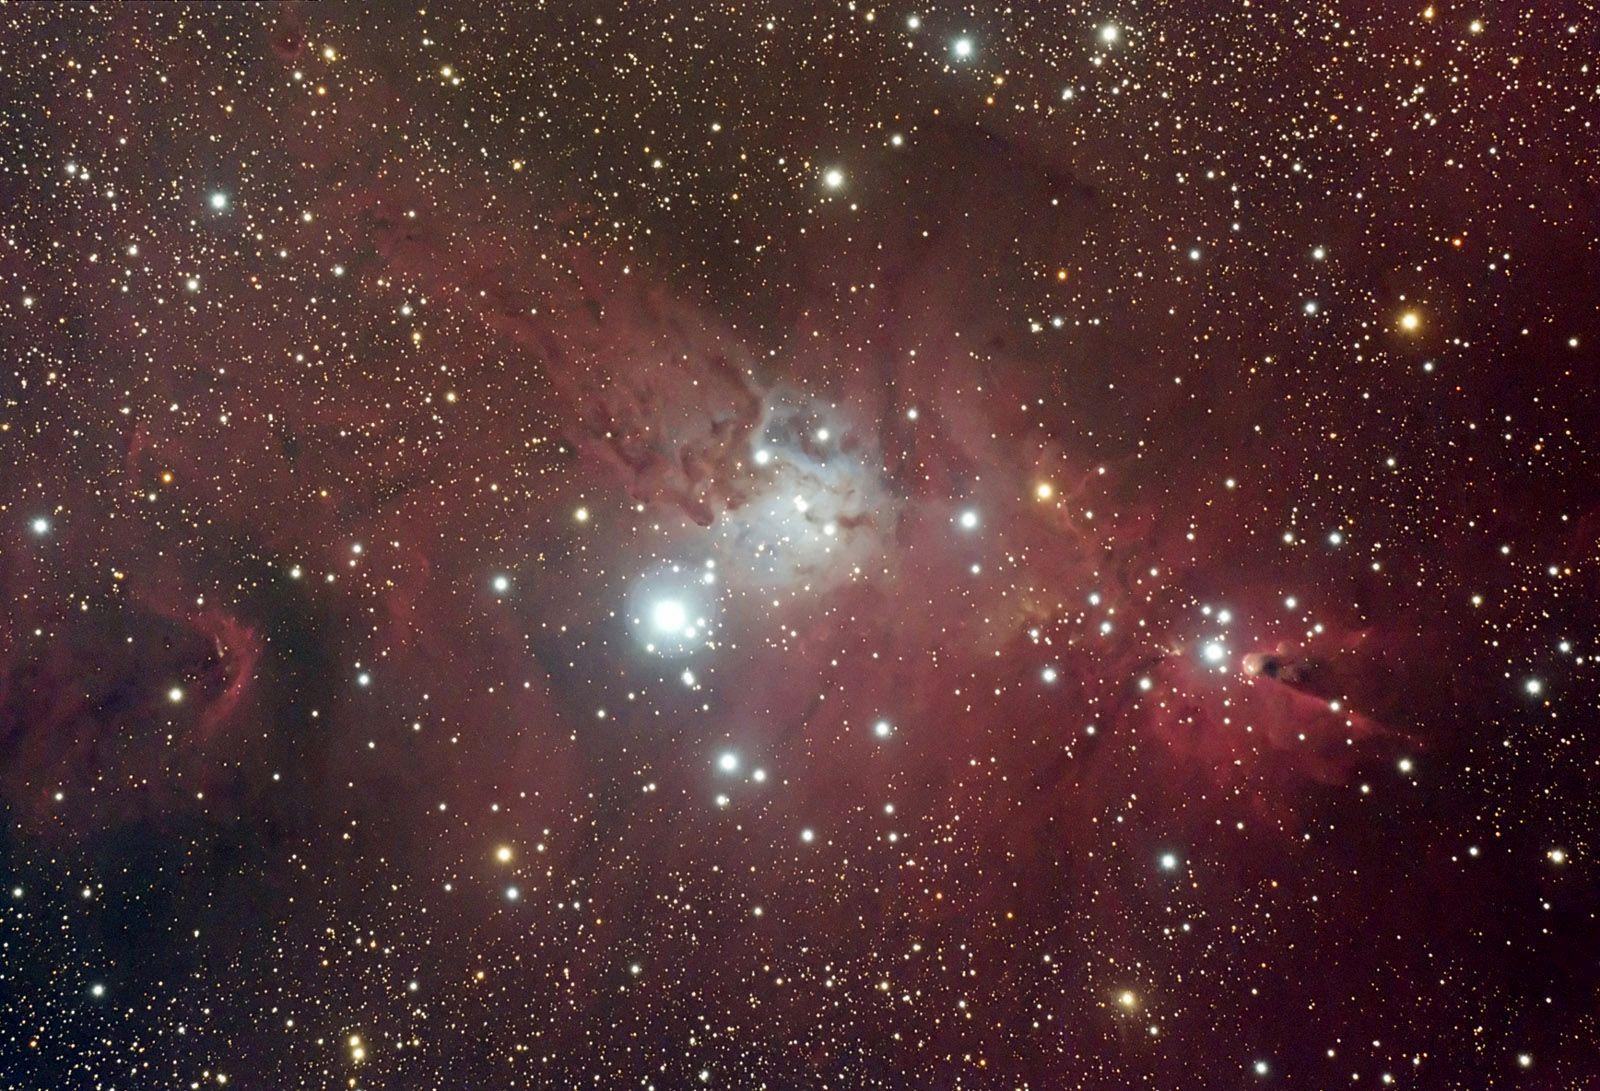 NGC 2264 - Nebula Complex in Monoceros